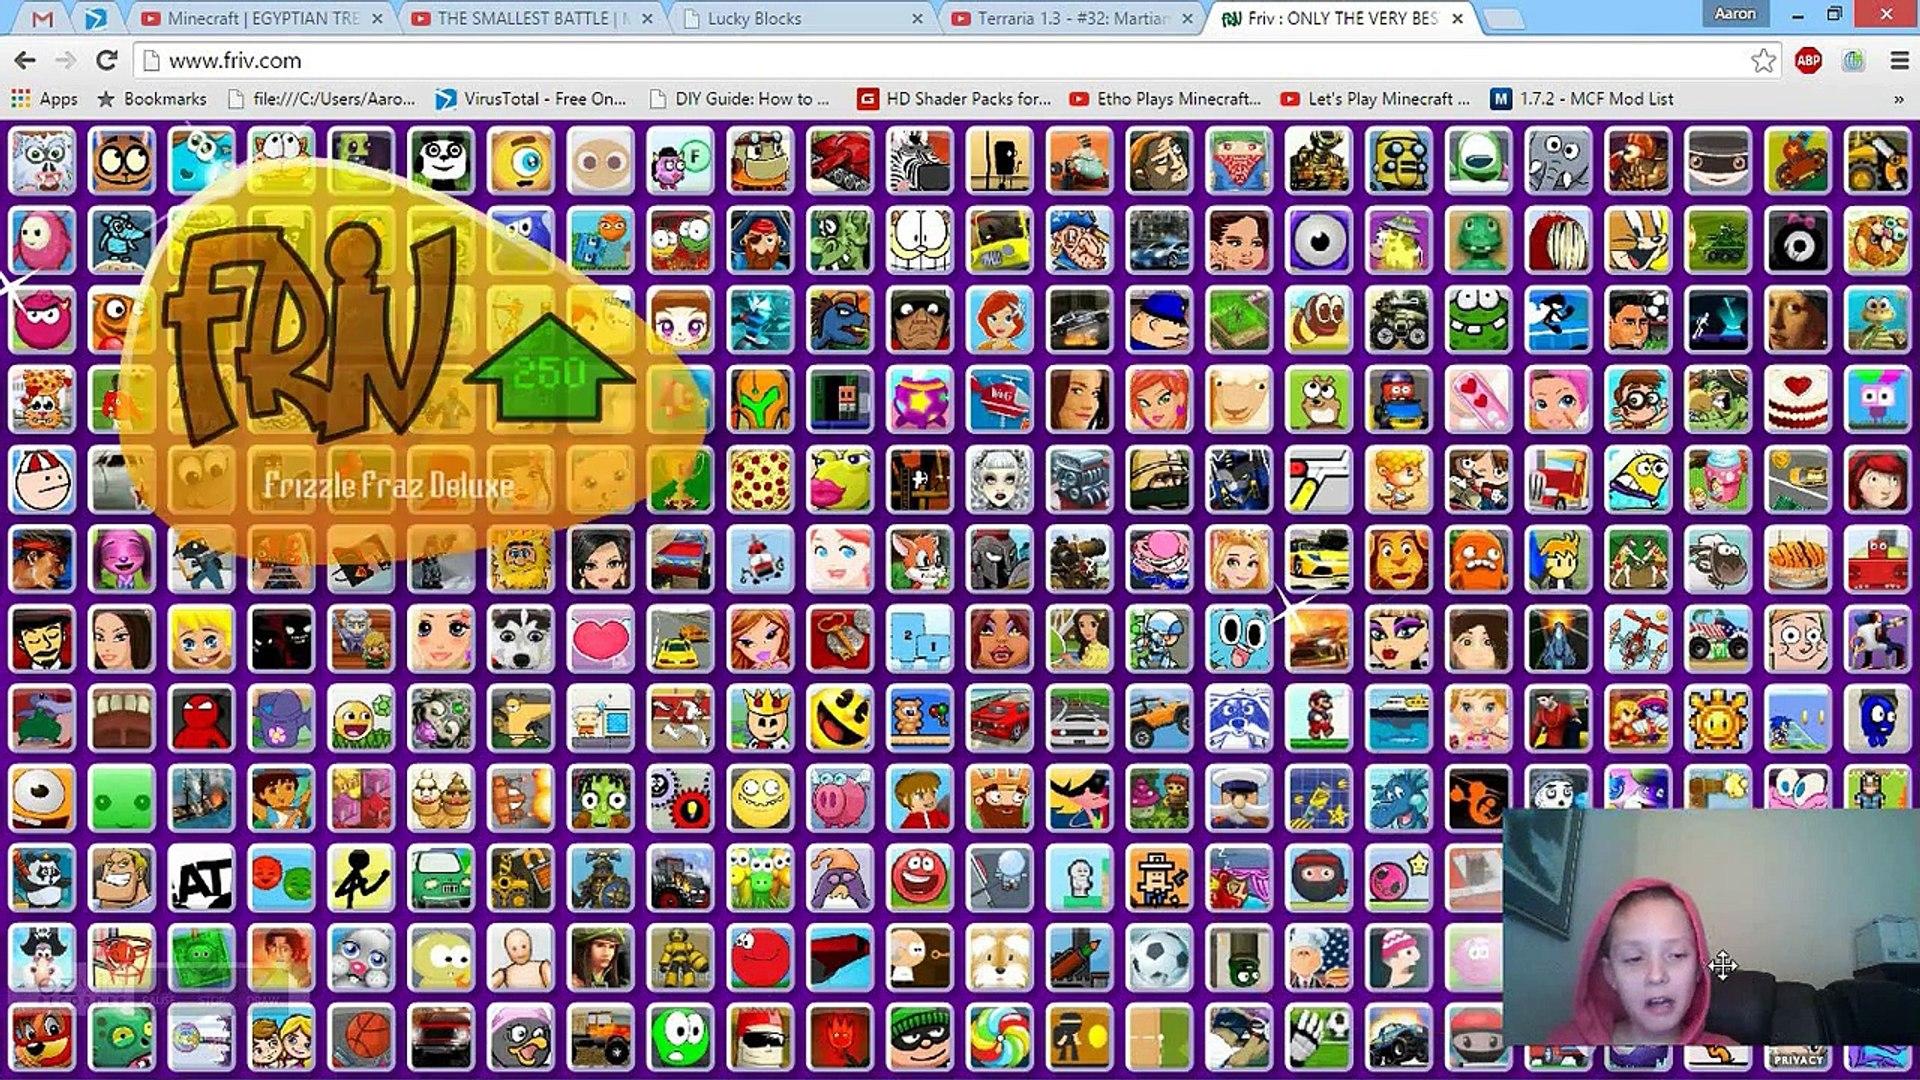 Friv games 2 com www 2 Players: